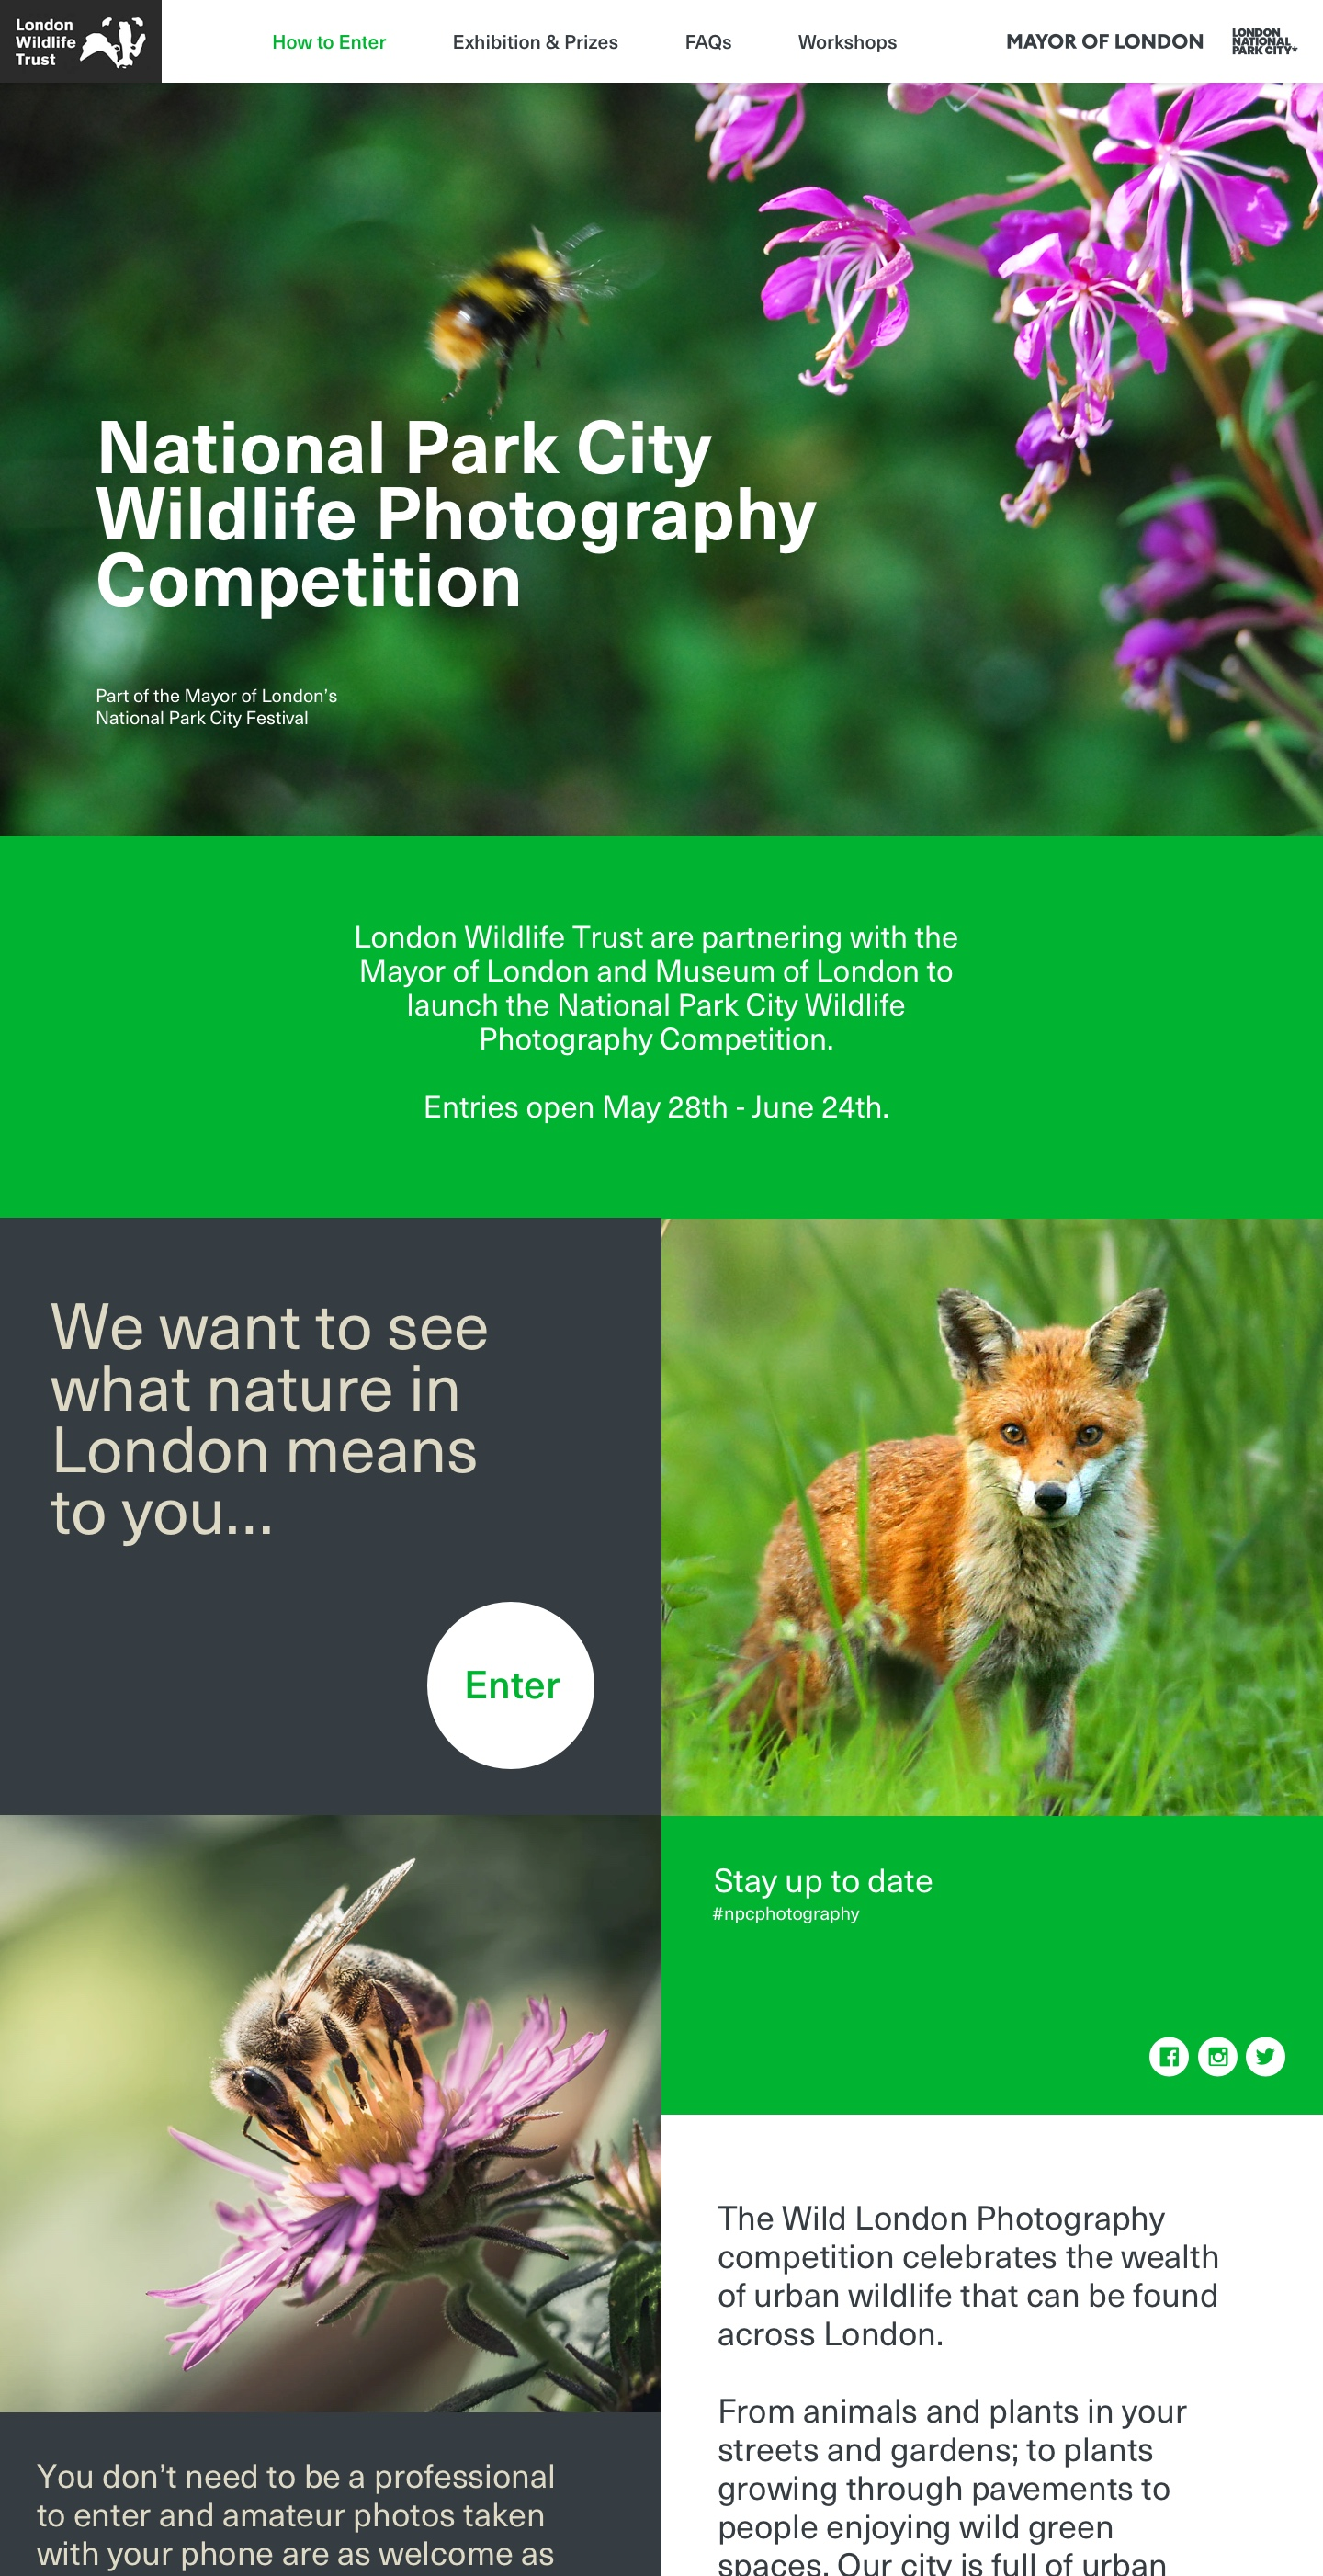 London Wildlife Trust homepage design - top